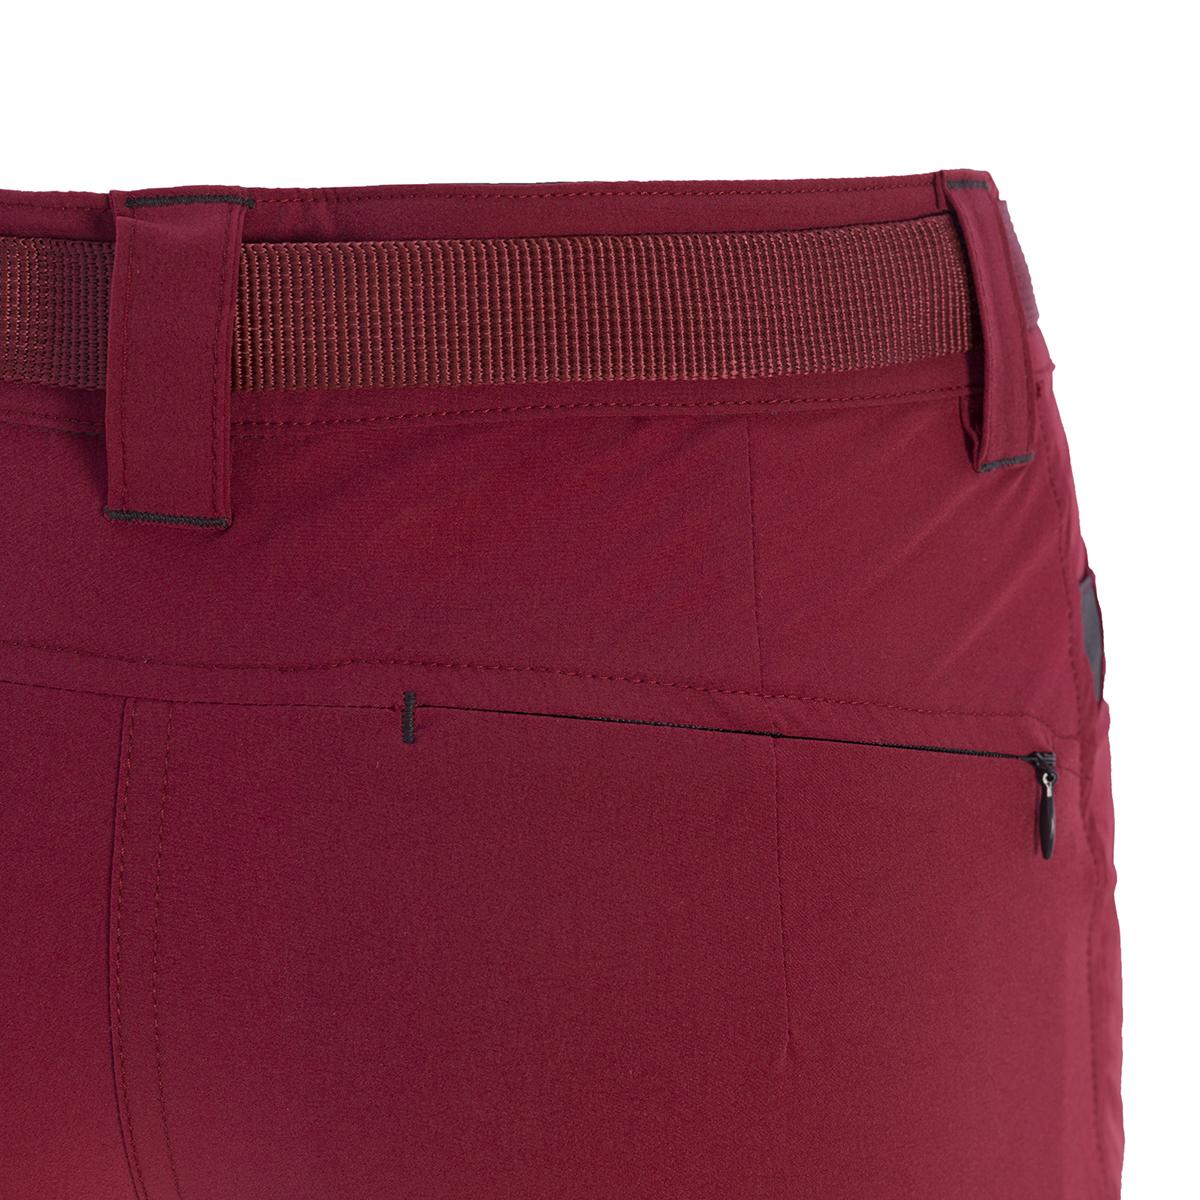 WOMAN'S TACORA STRECHT PANT RED